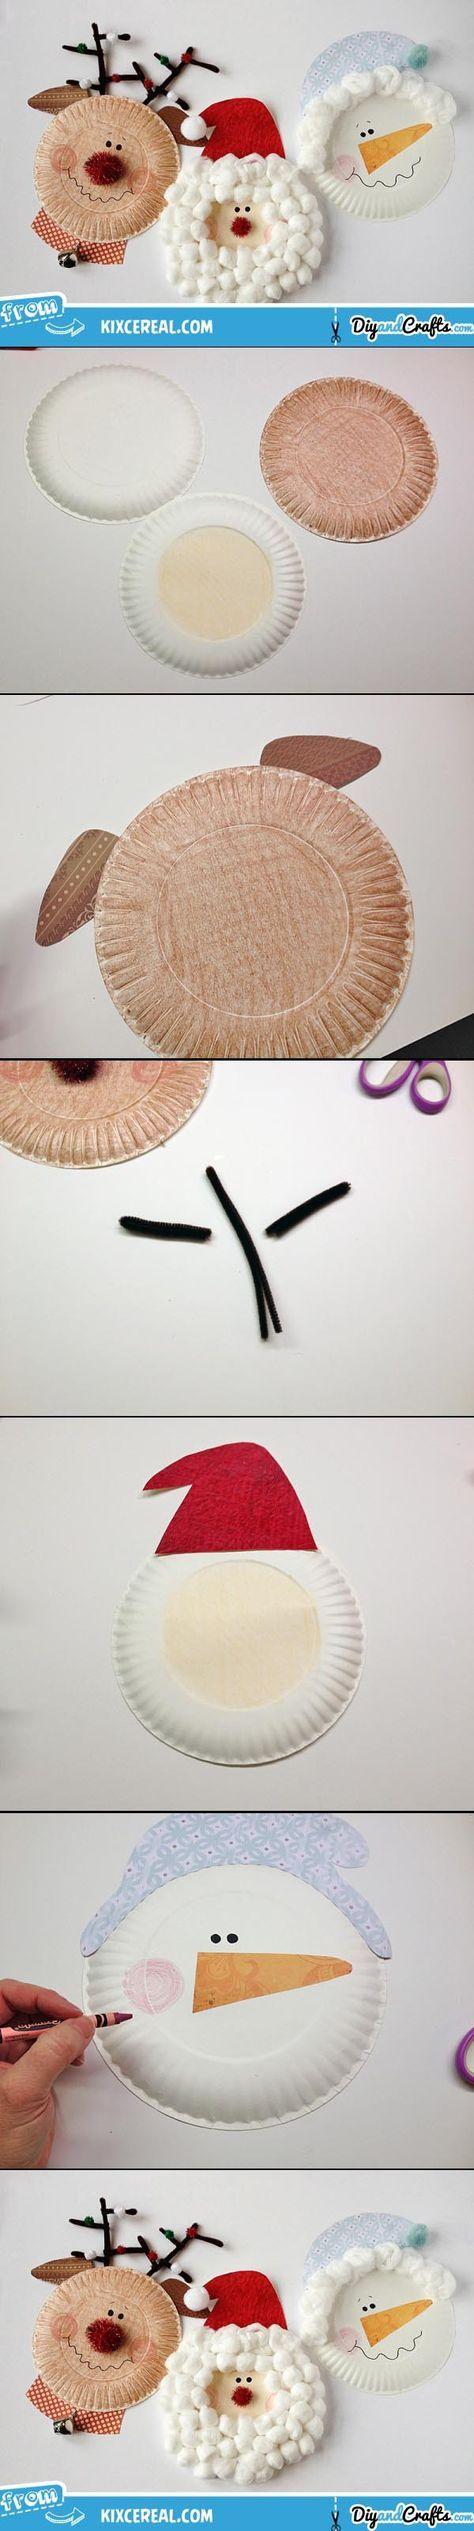 Paper Plate Christmas Characters- Santa, Rudolph, Snowman | #DIY